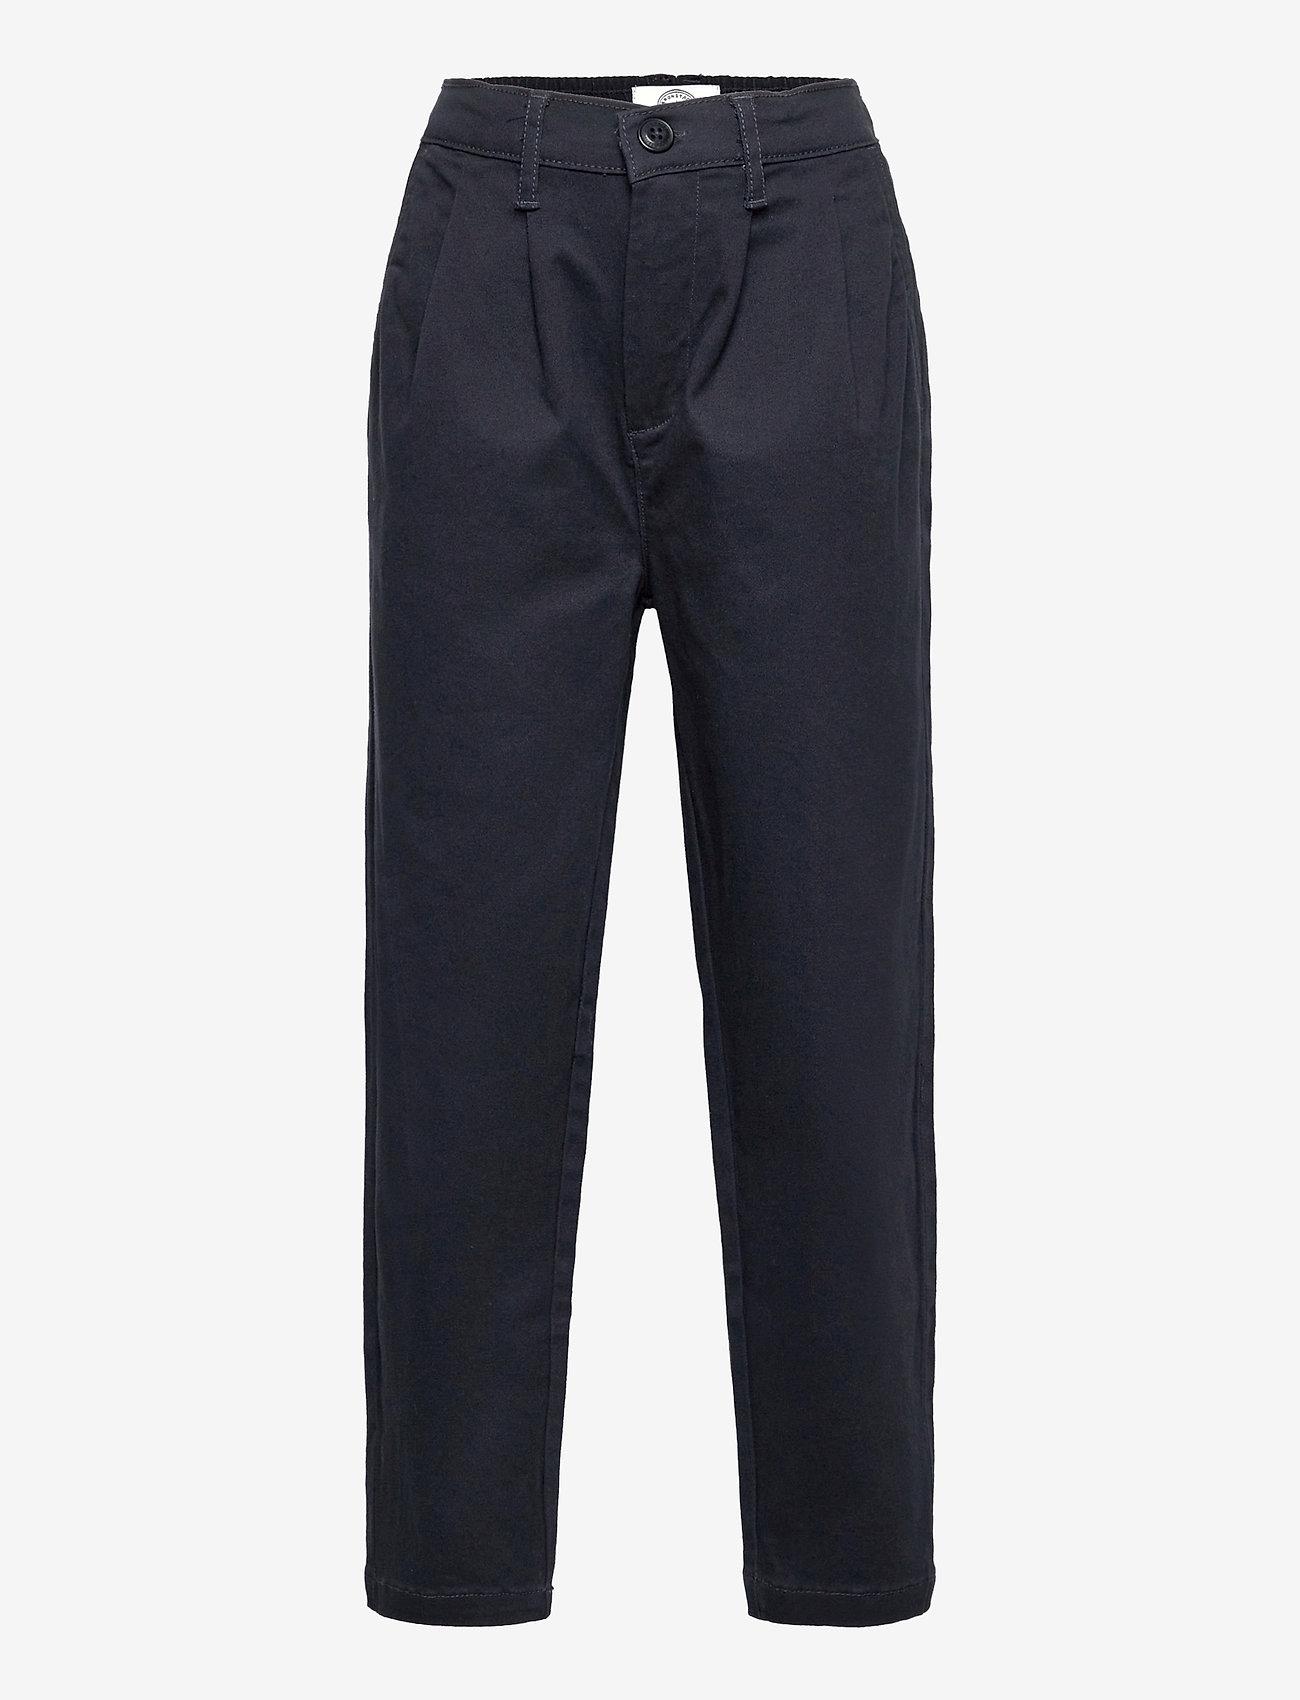 Kronstadt - Mason - trousers - navy - 0